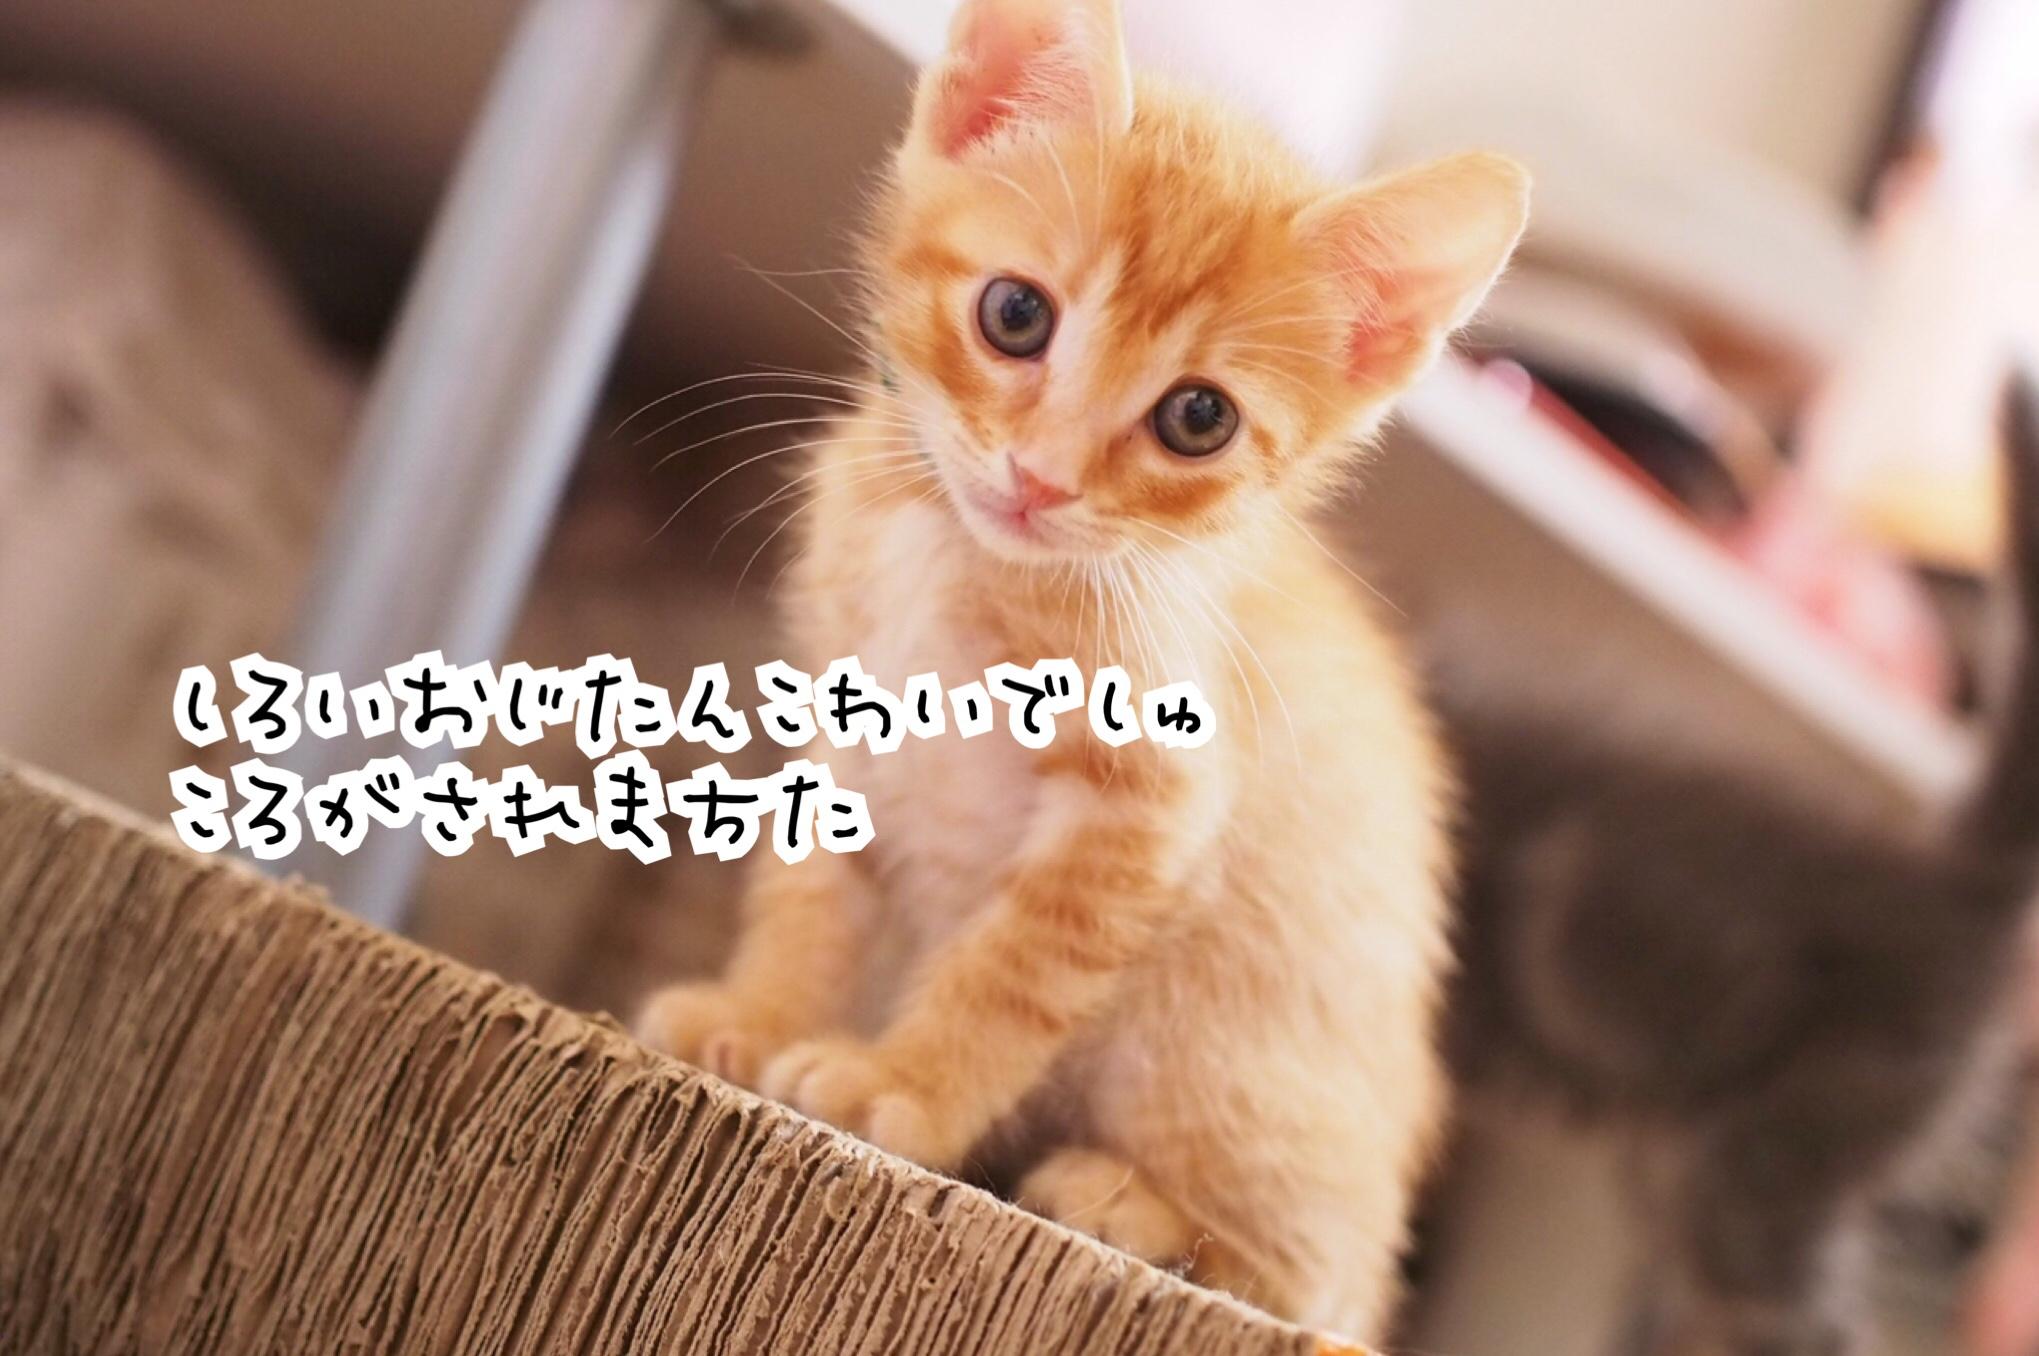 fc2blog_2018082416354787c.jpg